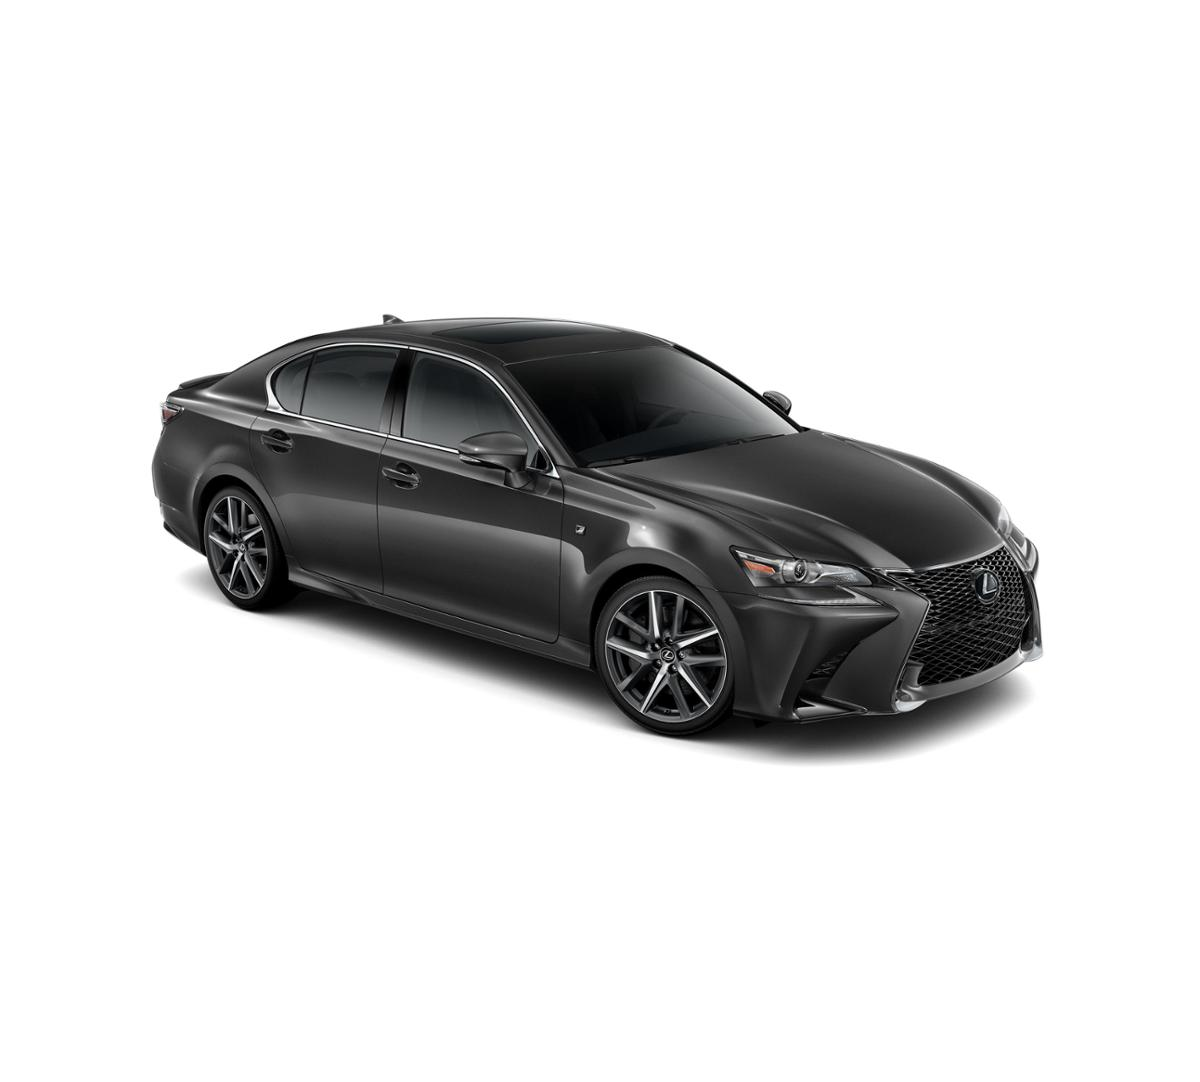 Lexus Gs Lease: New Smoky Granite Mica 2019 Lexus GS 350 F SPORT In West